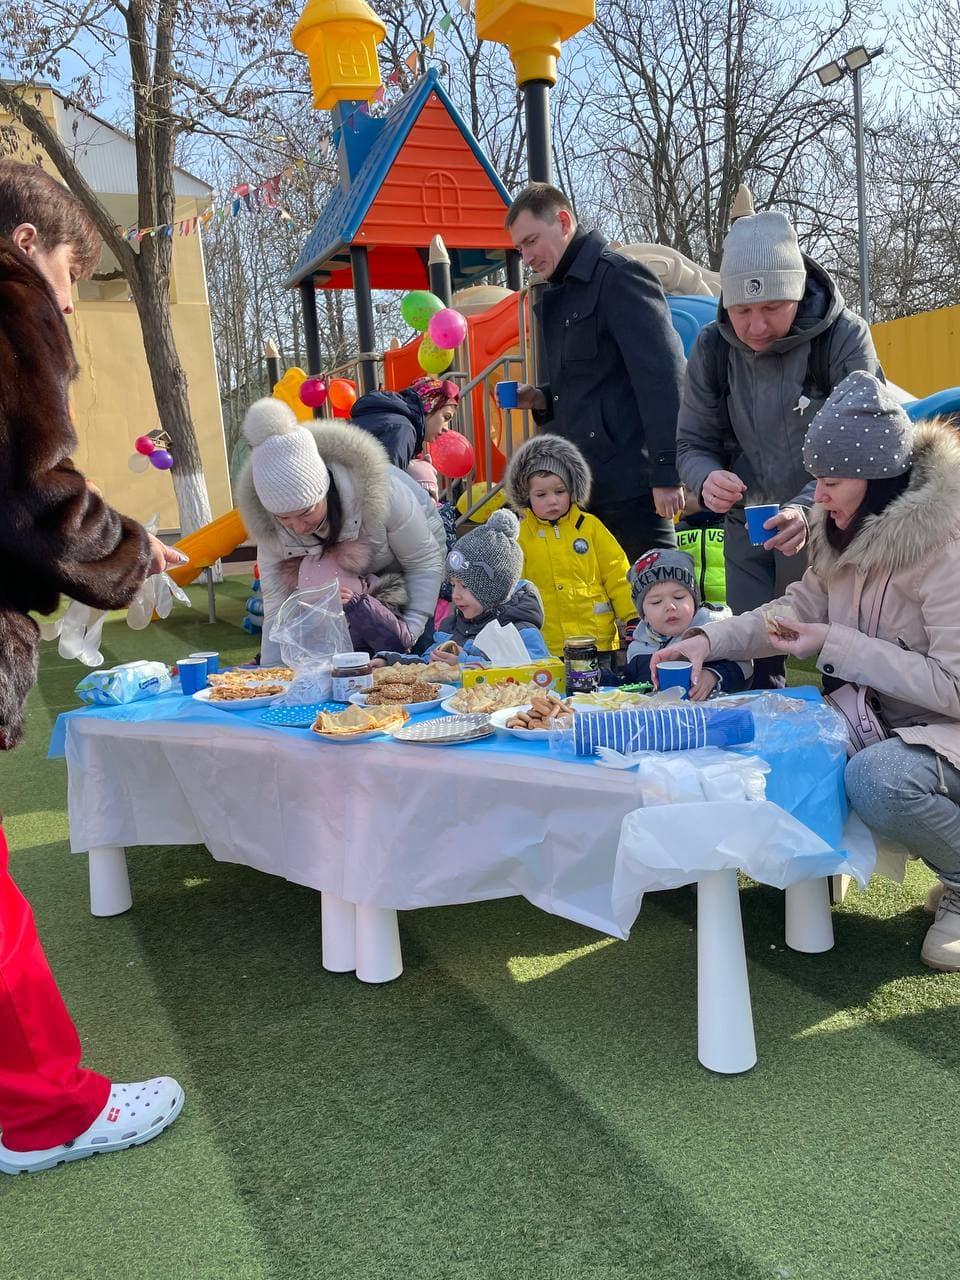 https://akademia-detstva.od.ua/app/uploads/2021/03/photo_2021-03-11_13-23-21.jpg